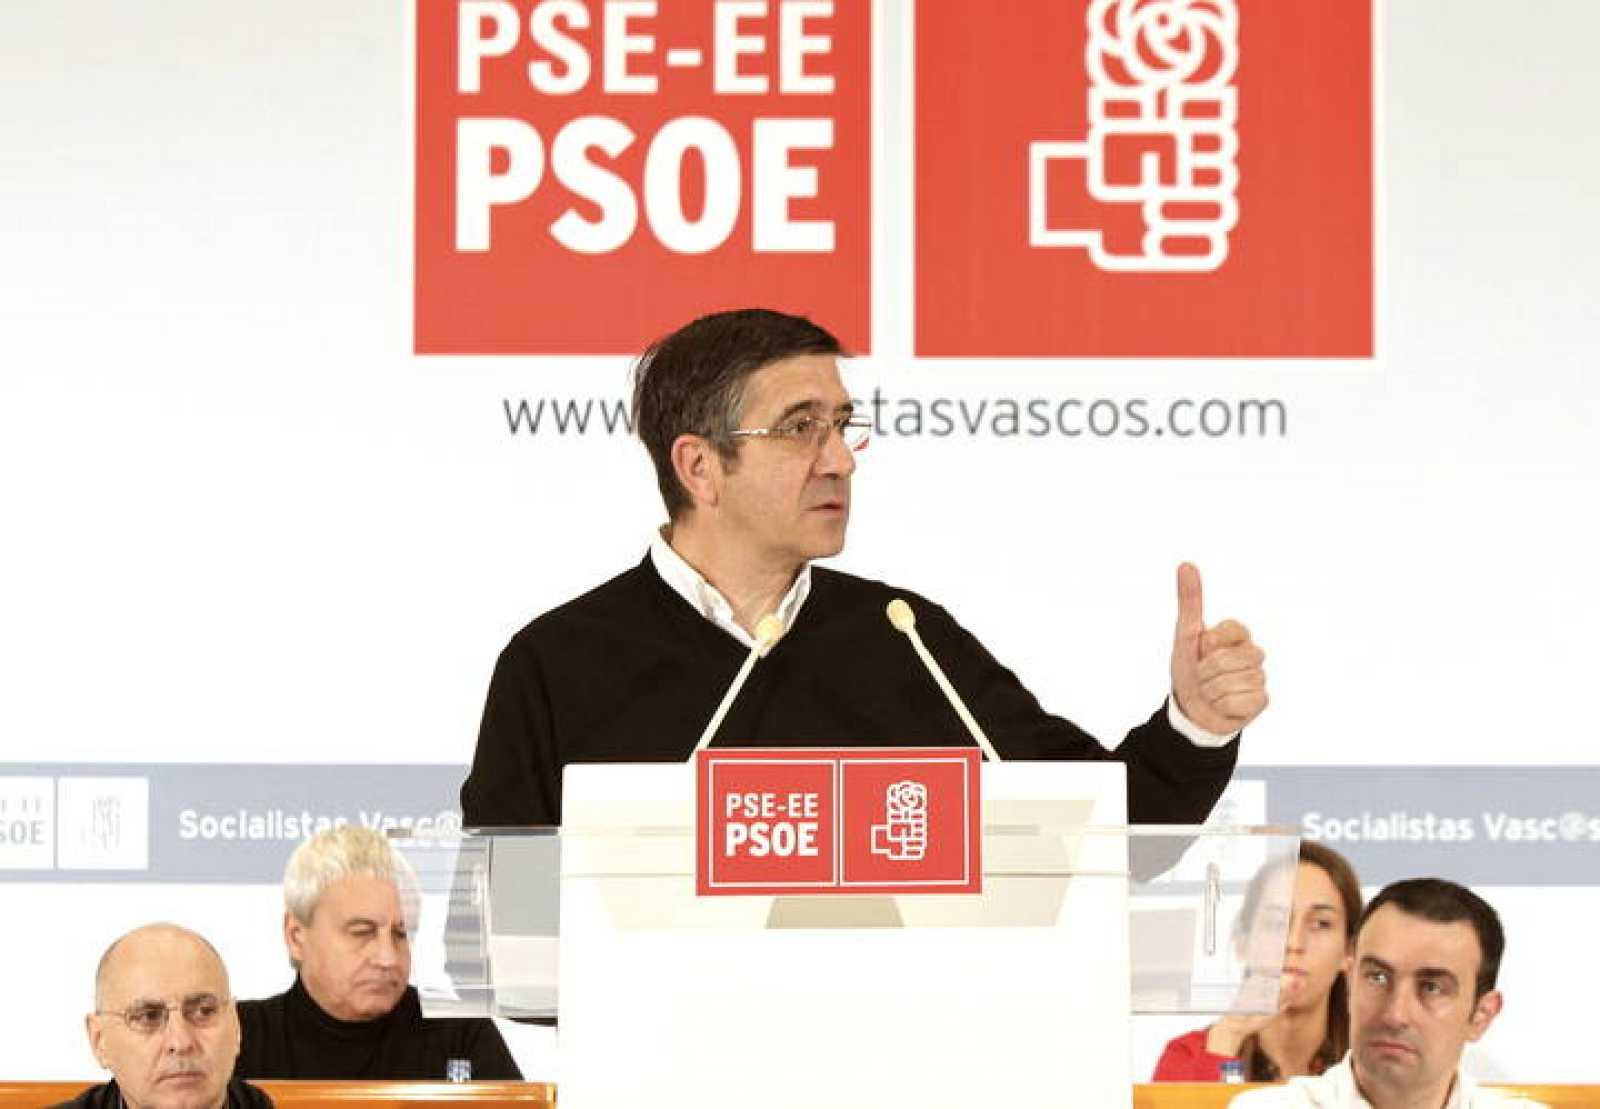 "EL LEHENDAKARI AFIRMA QUE ACABARÁ LA LEGISLATURA ""LE PESE A QUIEN LE PESE"""